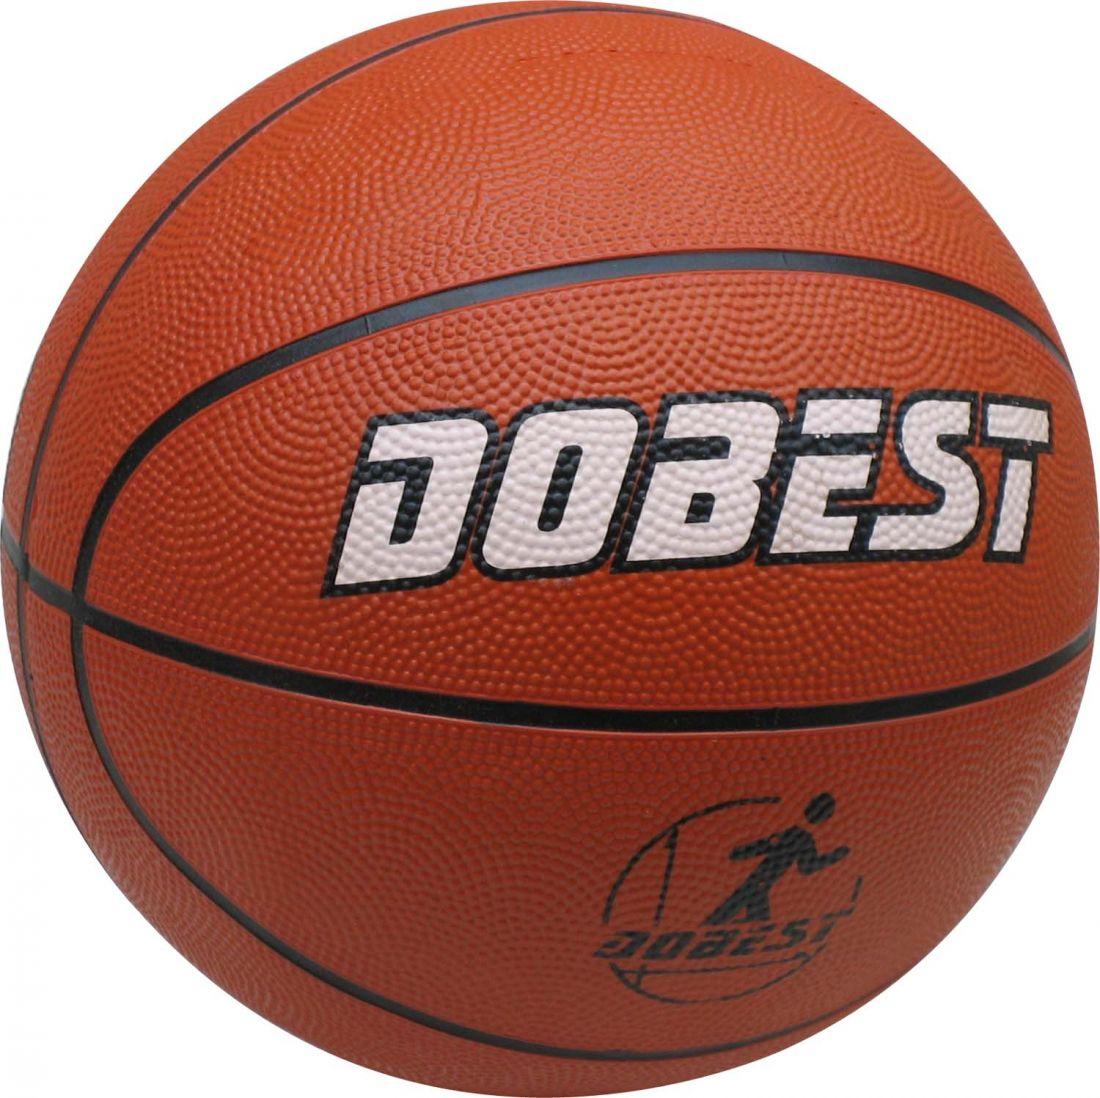 Мяч баскетбольный №7 DOBEST RB7-0886